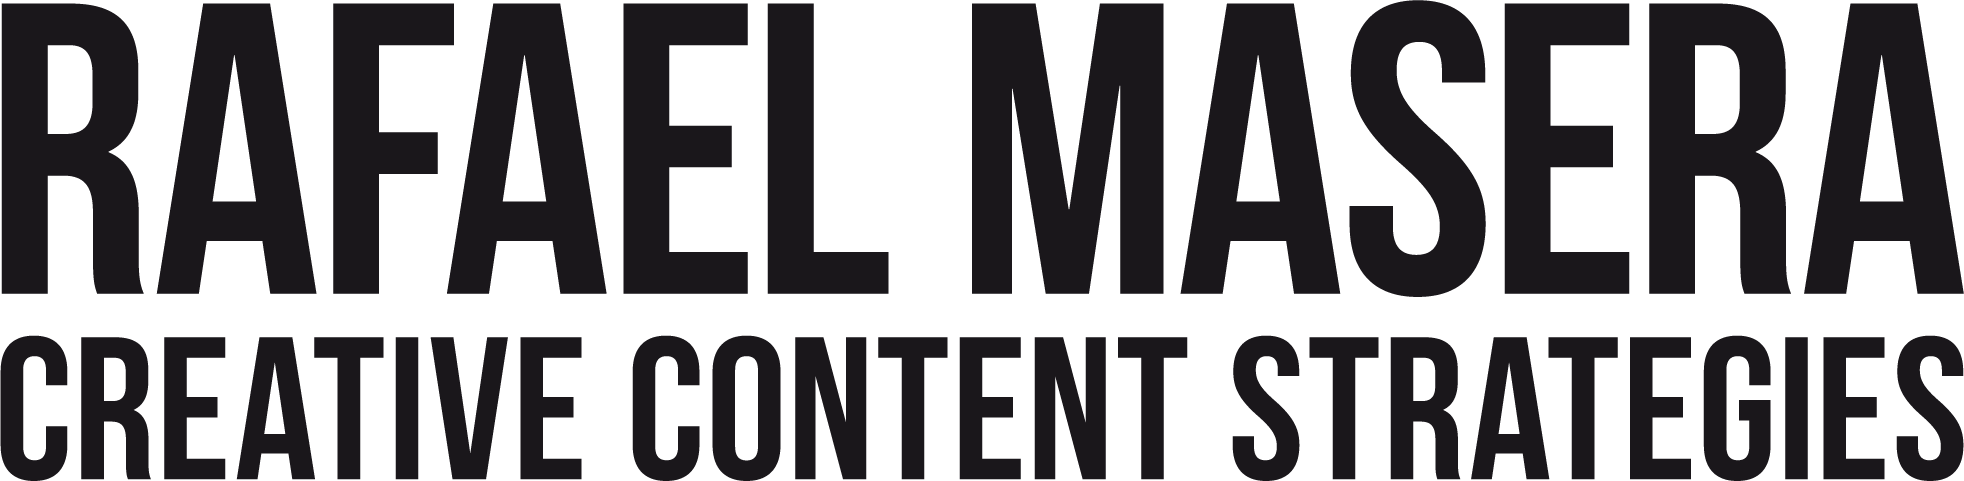 Rafael Masera Logo